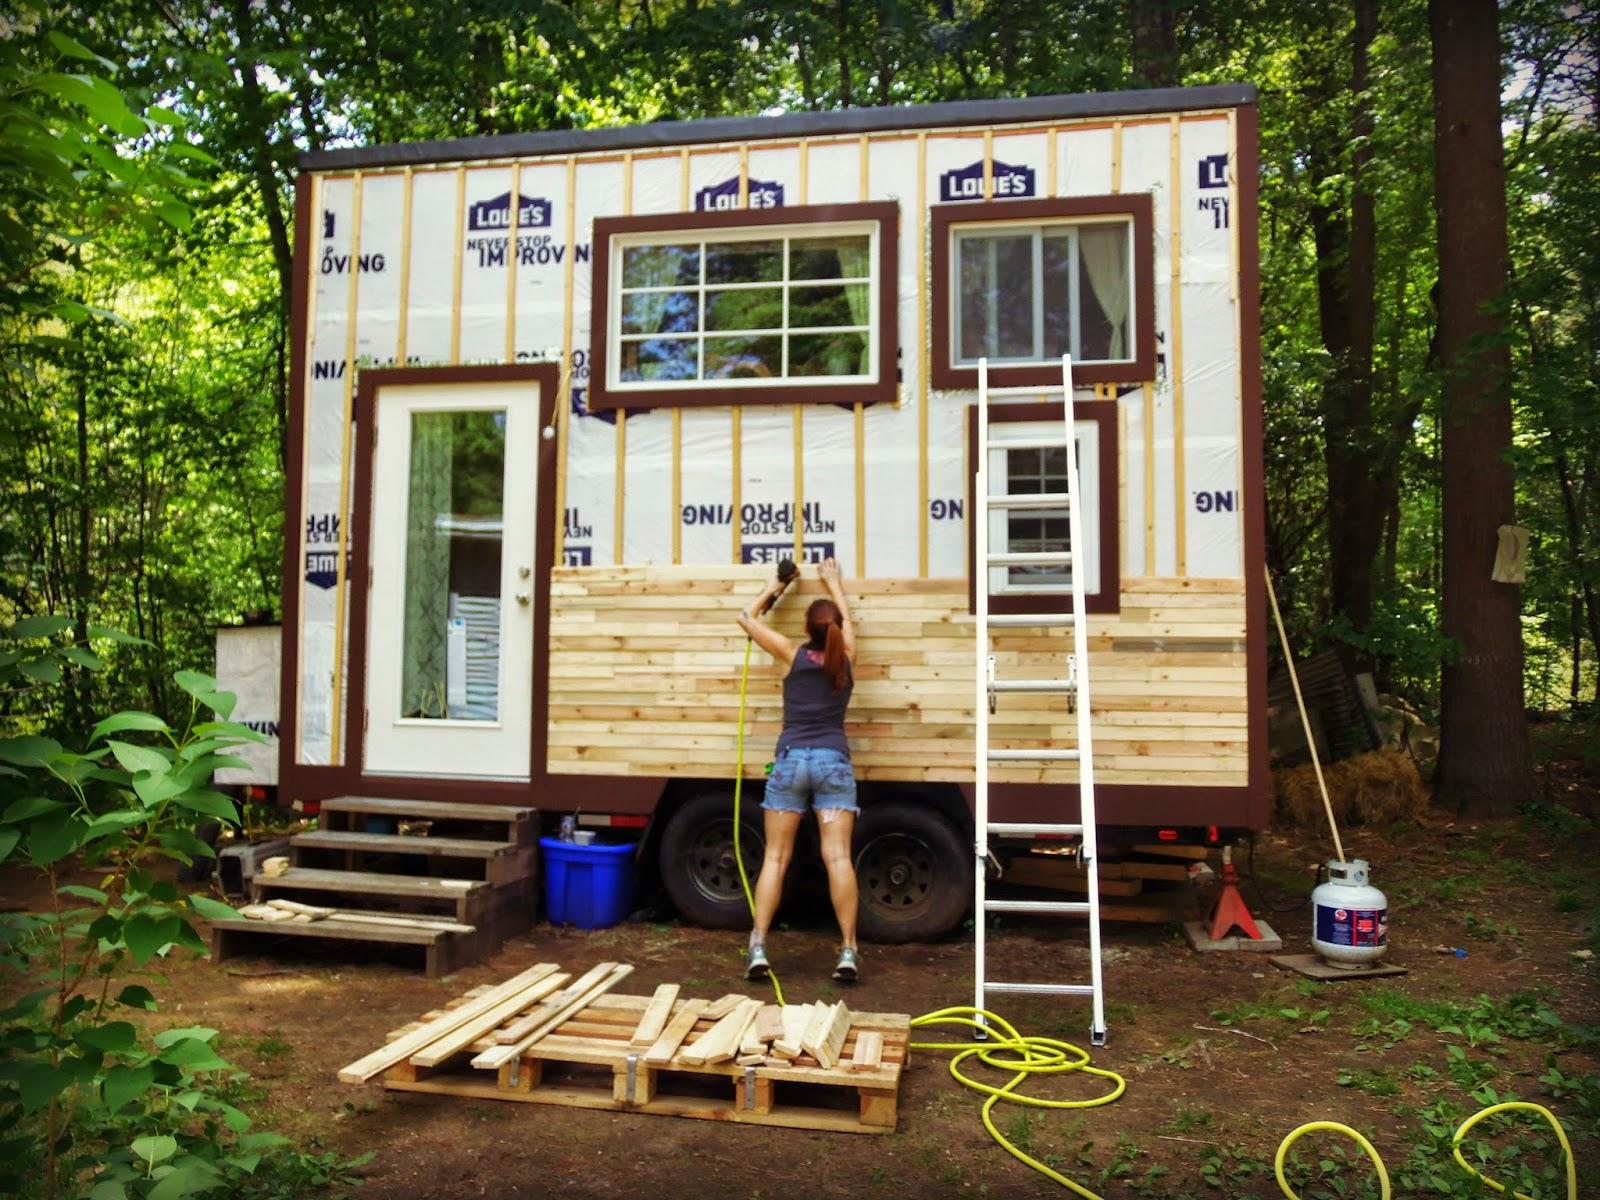 Another tiny house story at long last visual progress for 3 story tiny house